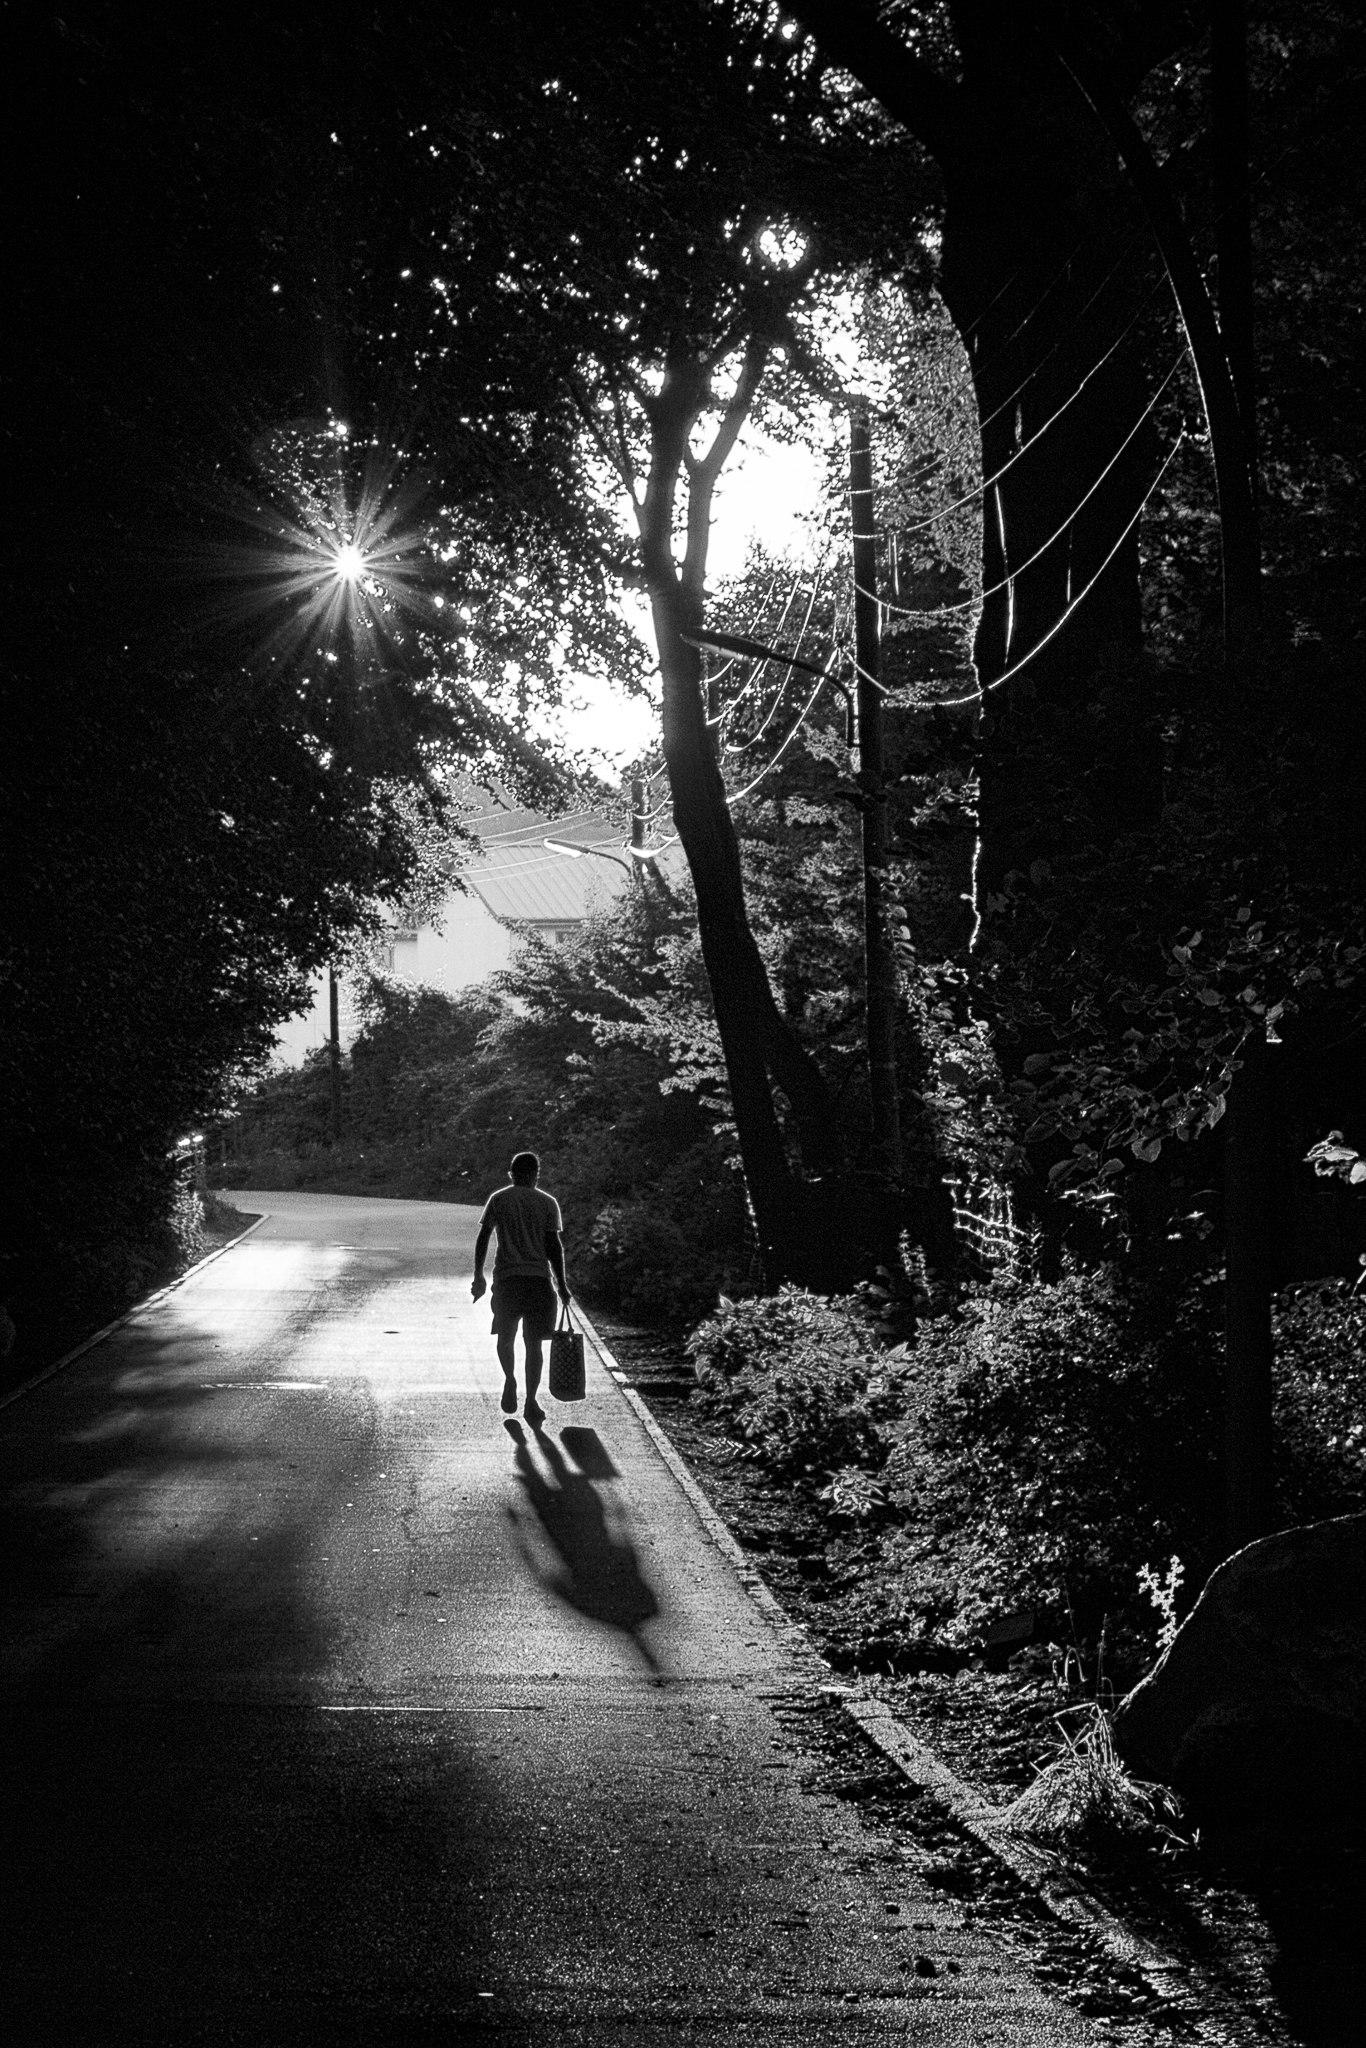 Sun (BW - photography, ellophotography - gkowallek | ello